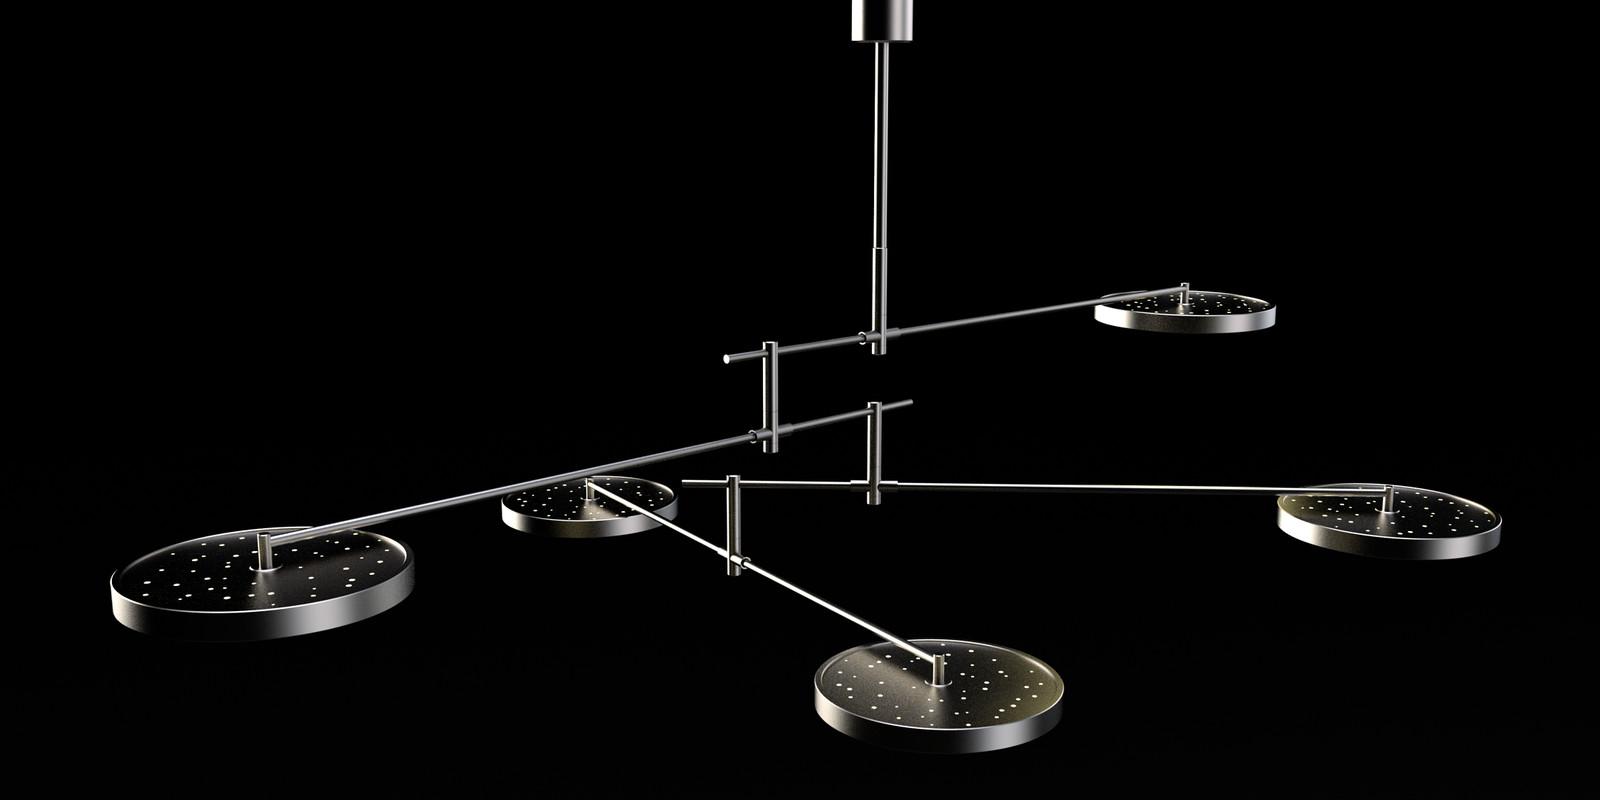 SketchUp + Thea Render Holly Hunt Lamp by DK detail 03